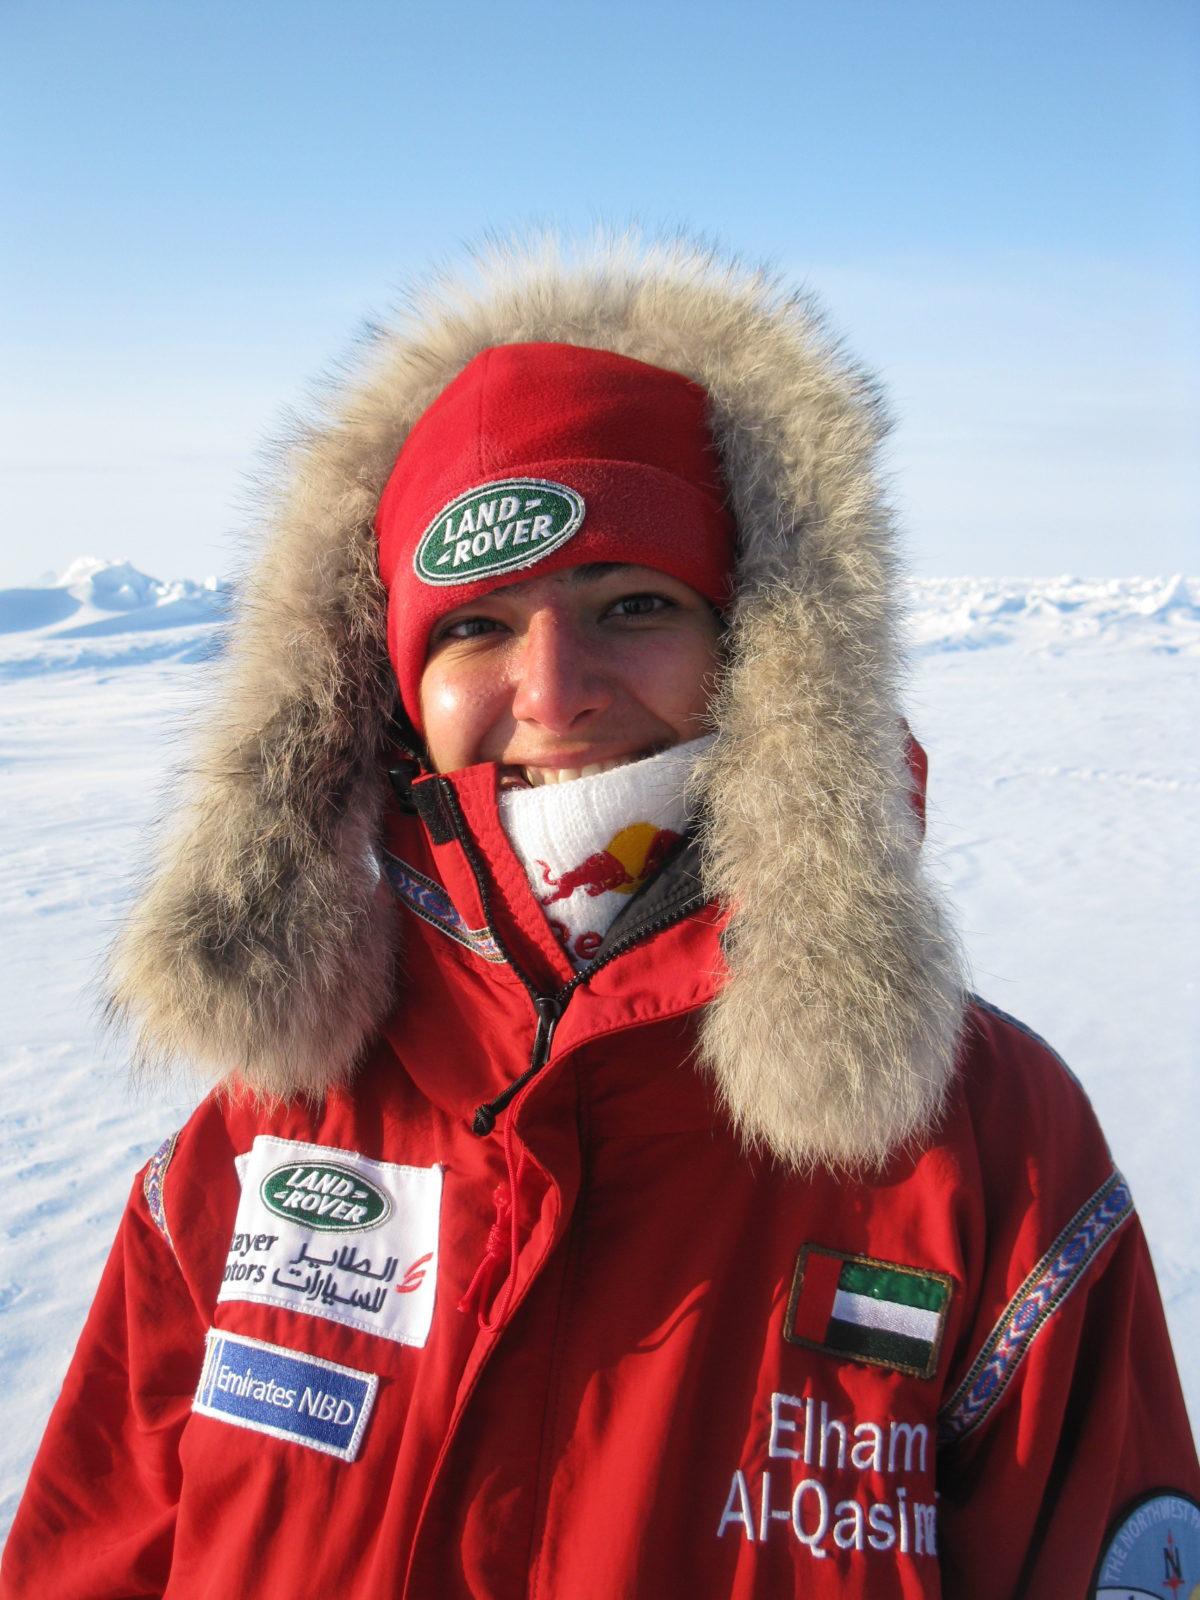 Elham Al Qasimi North Pole - Ladies with Zest